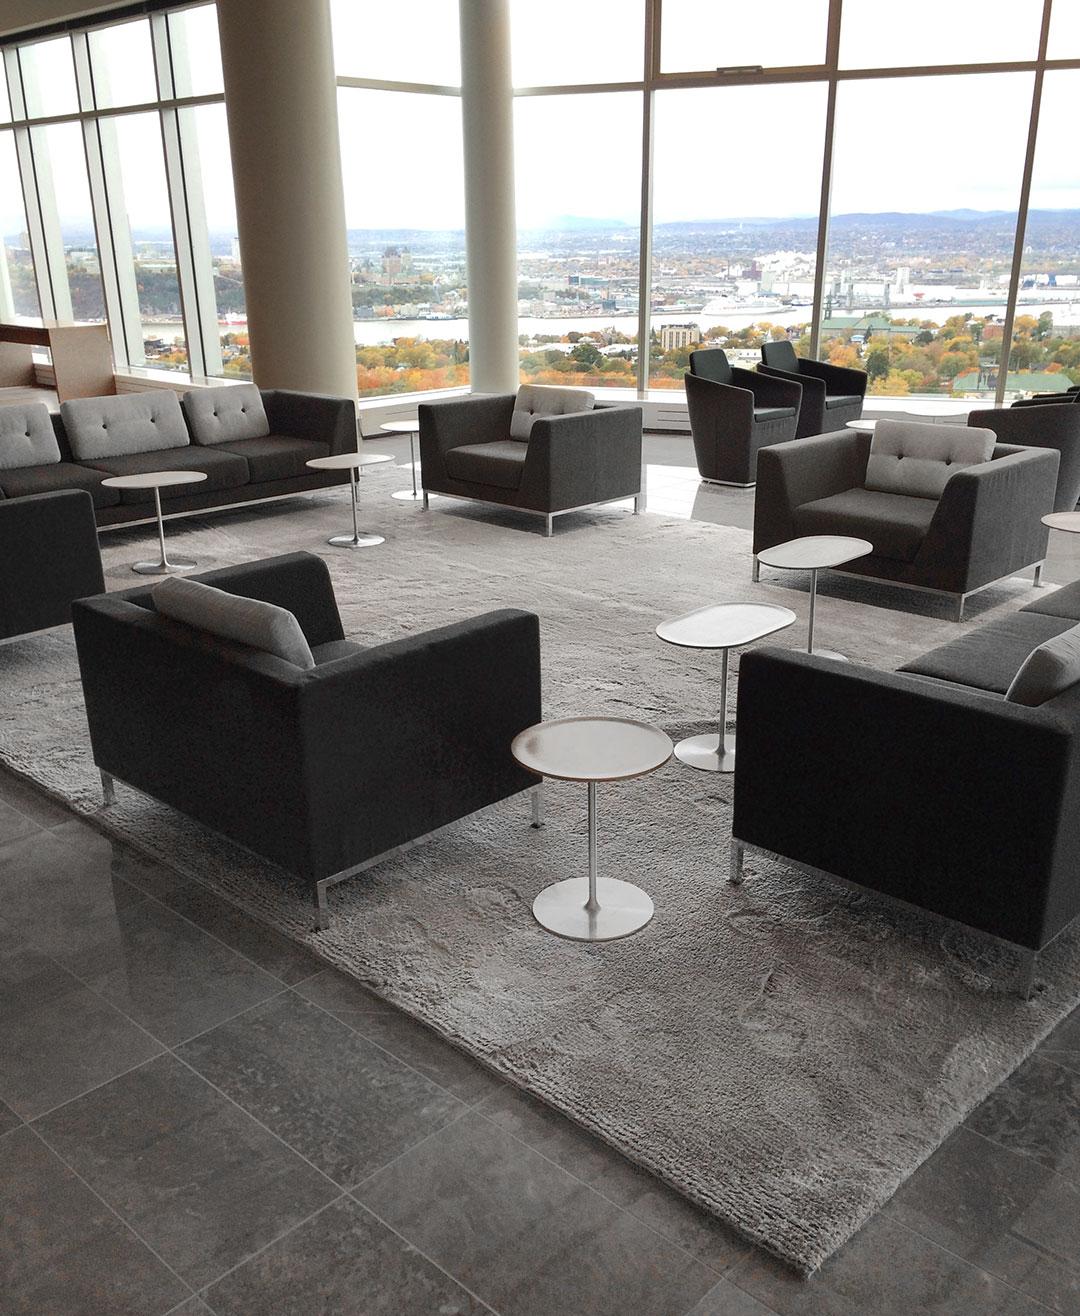 Exquisite Rug for Luxury Office Space | Custom Rug | Urba Rugs Canada